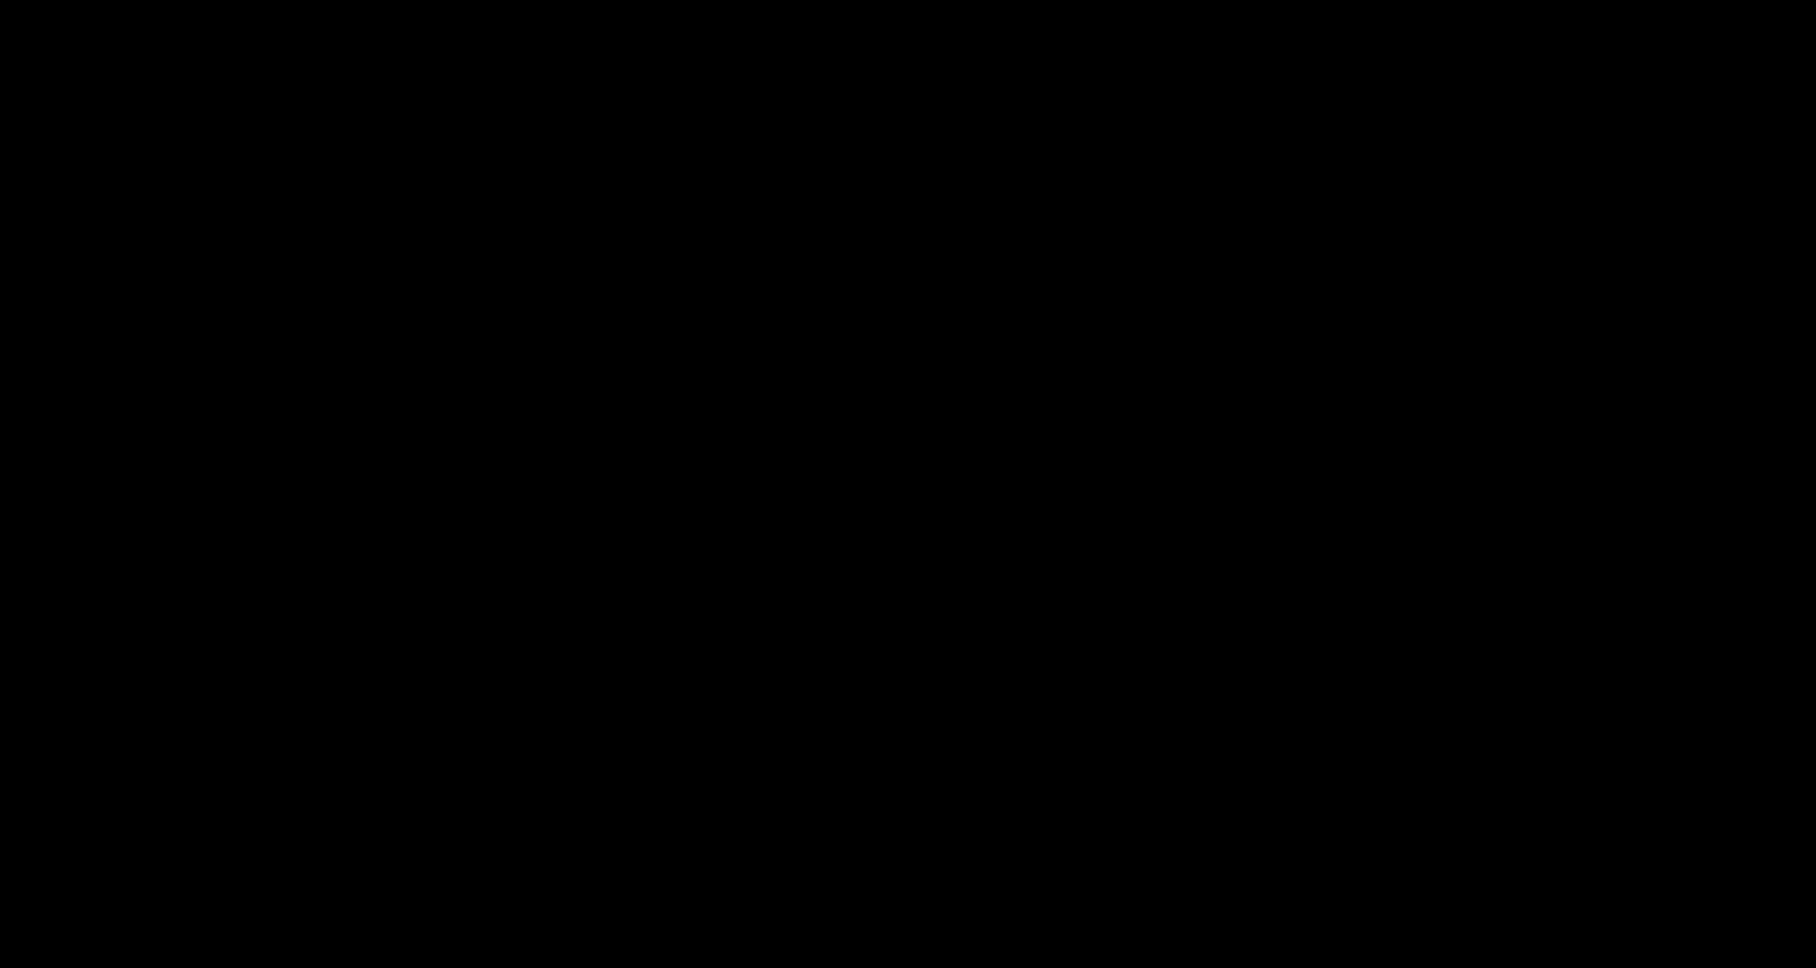 LapseWolf v1